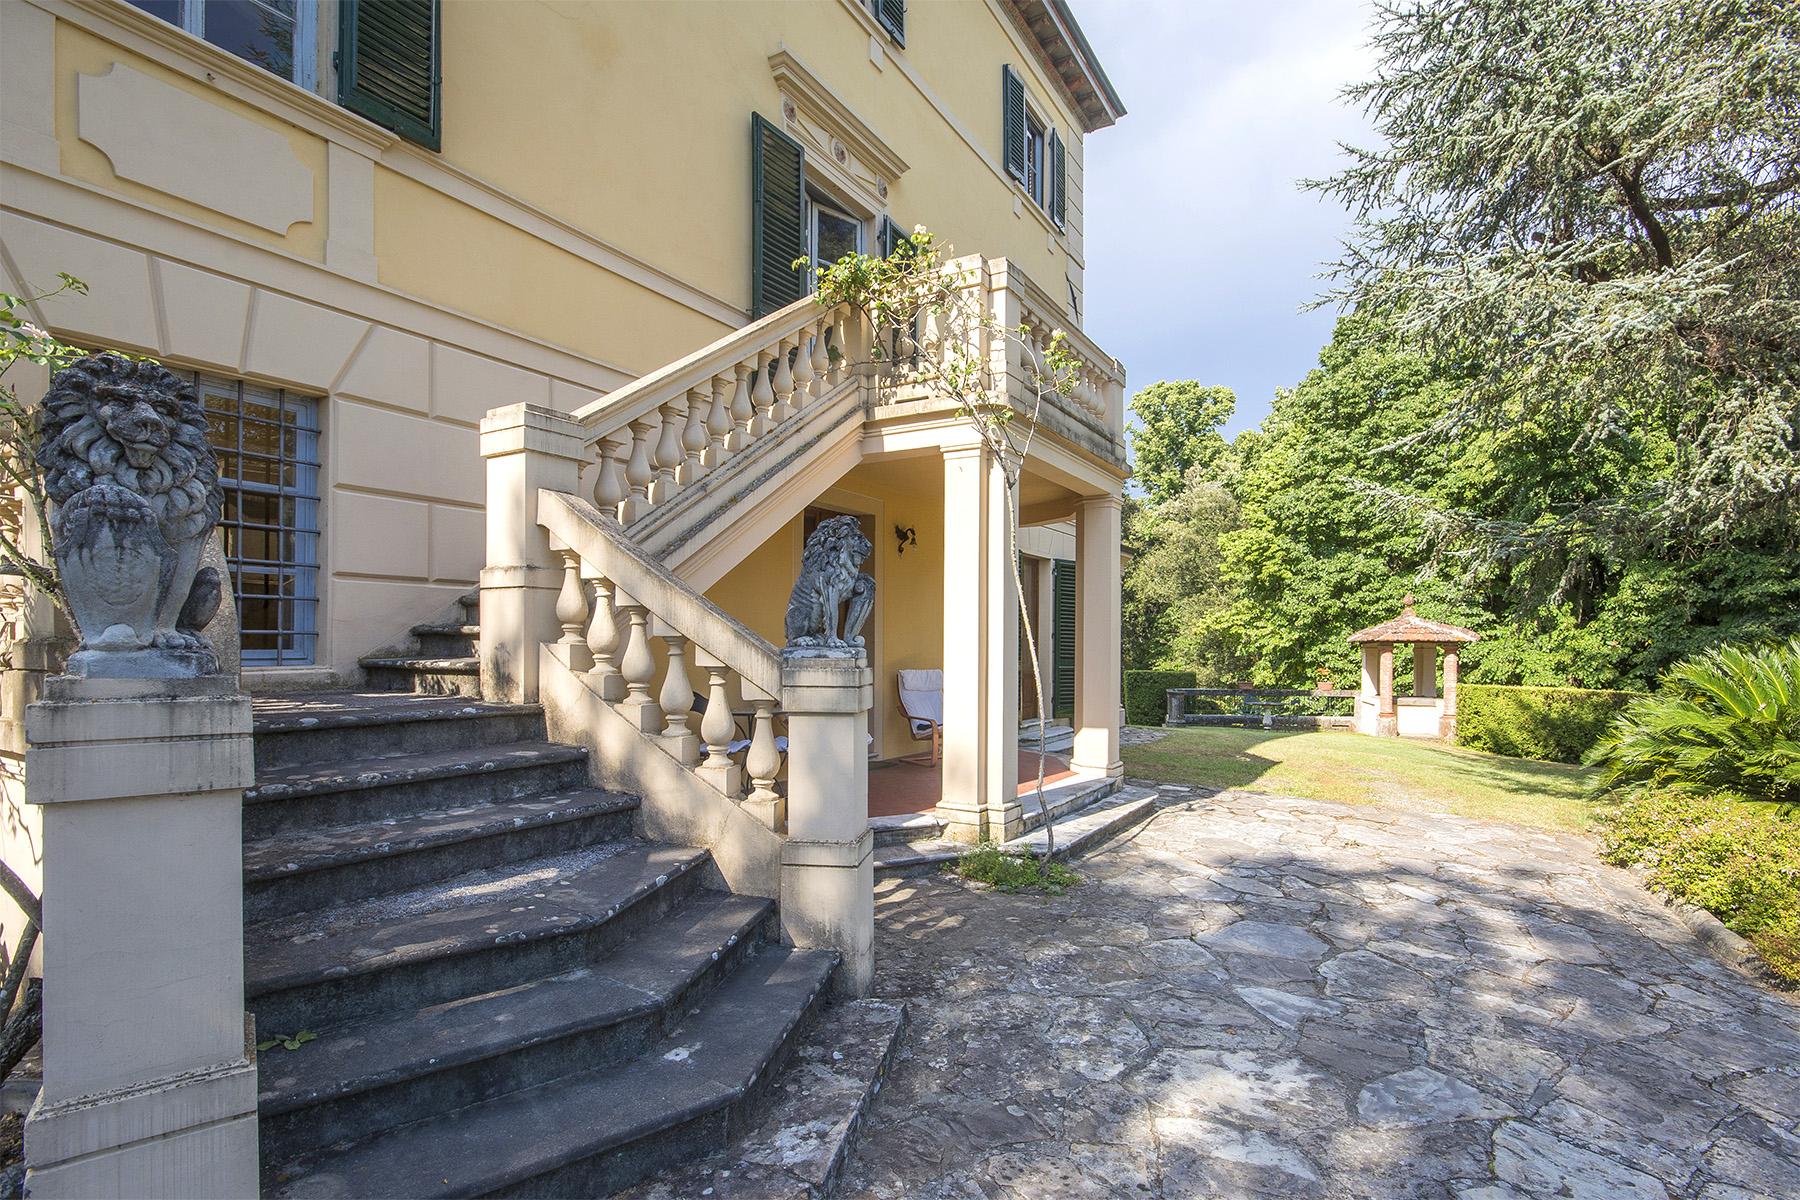 Villa in Vendita a Lucca: 5 locali, 1150 mq - Foto 3